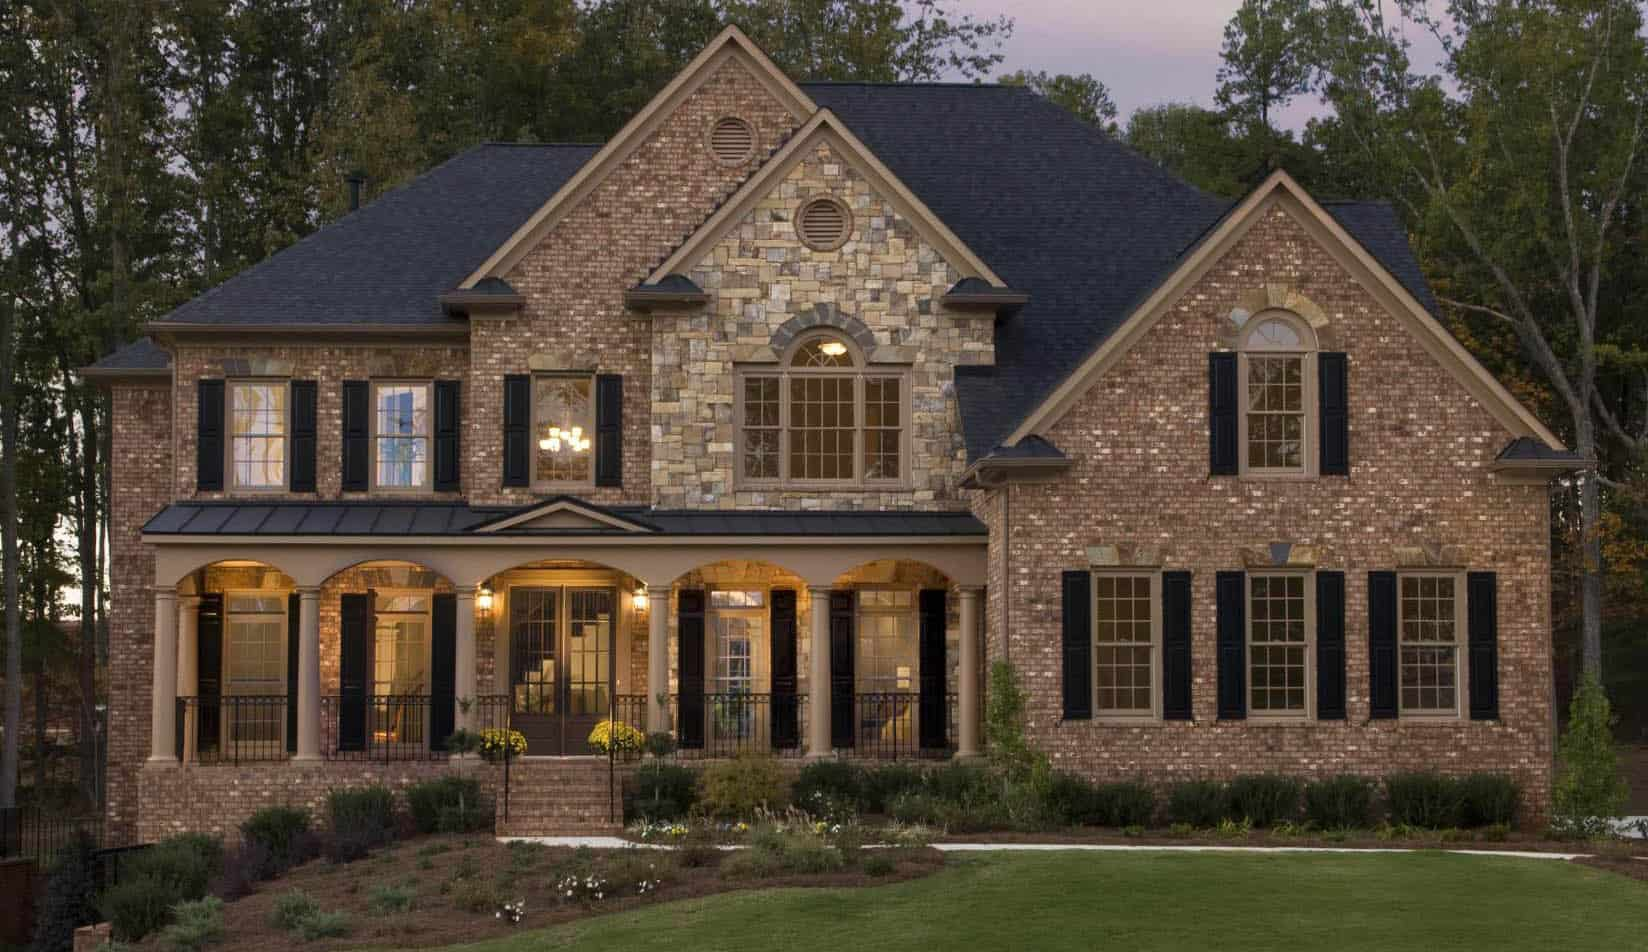 Brick Work House - Masonry Plus